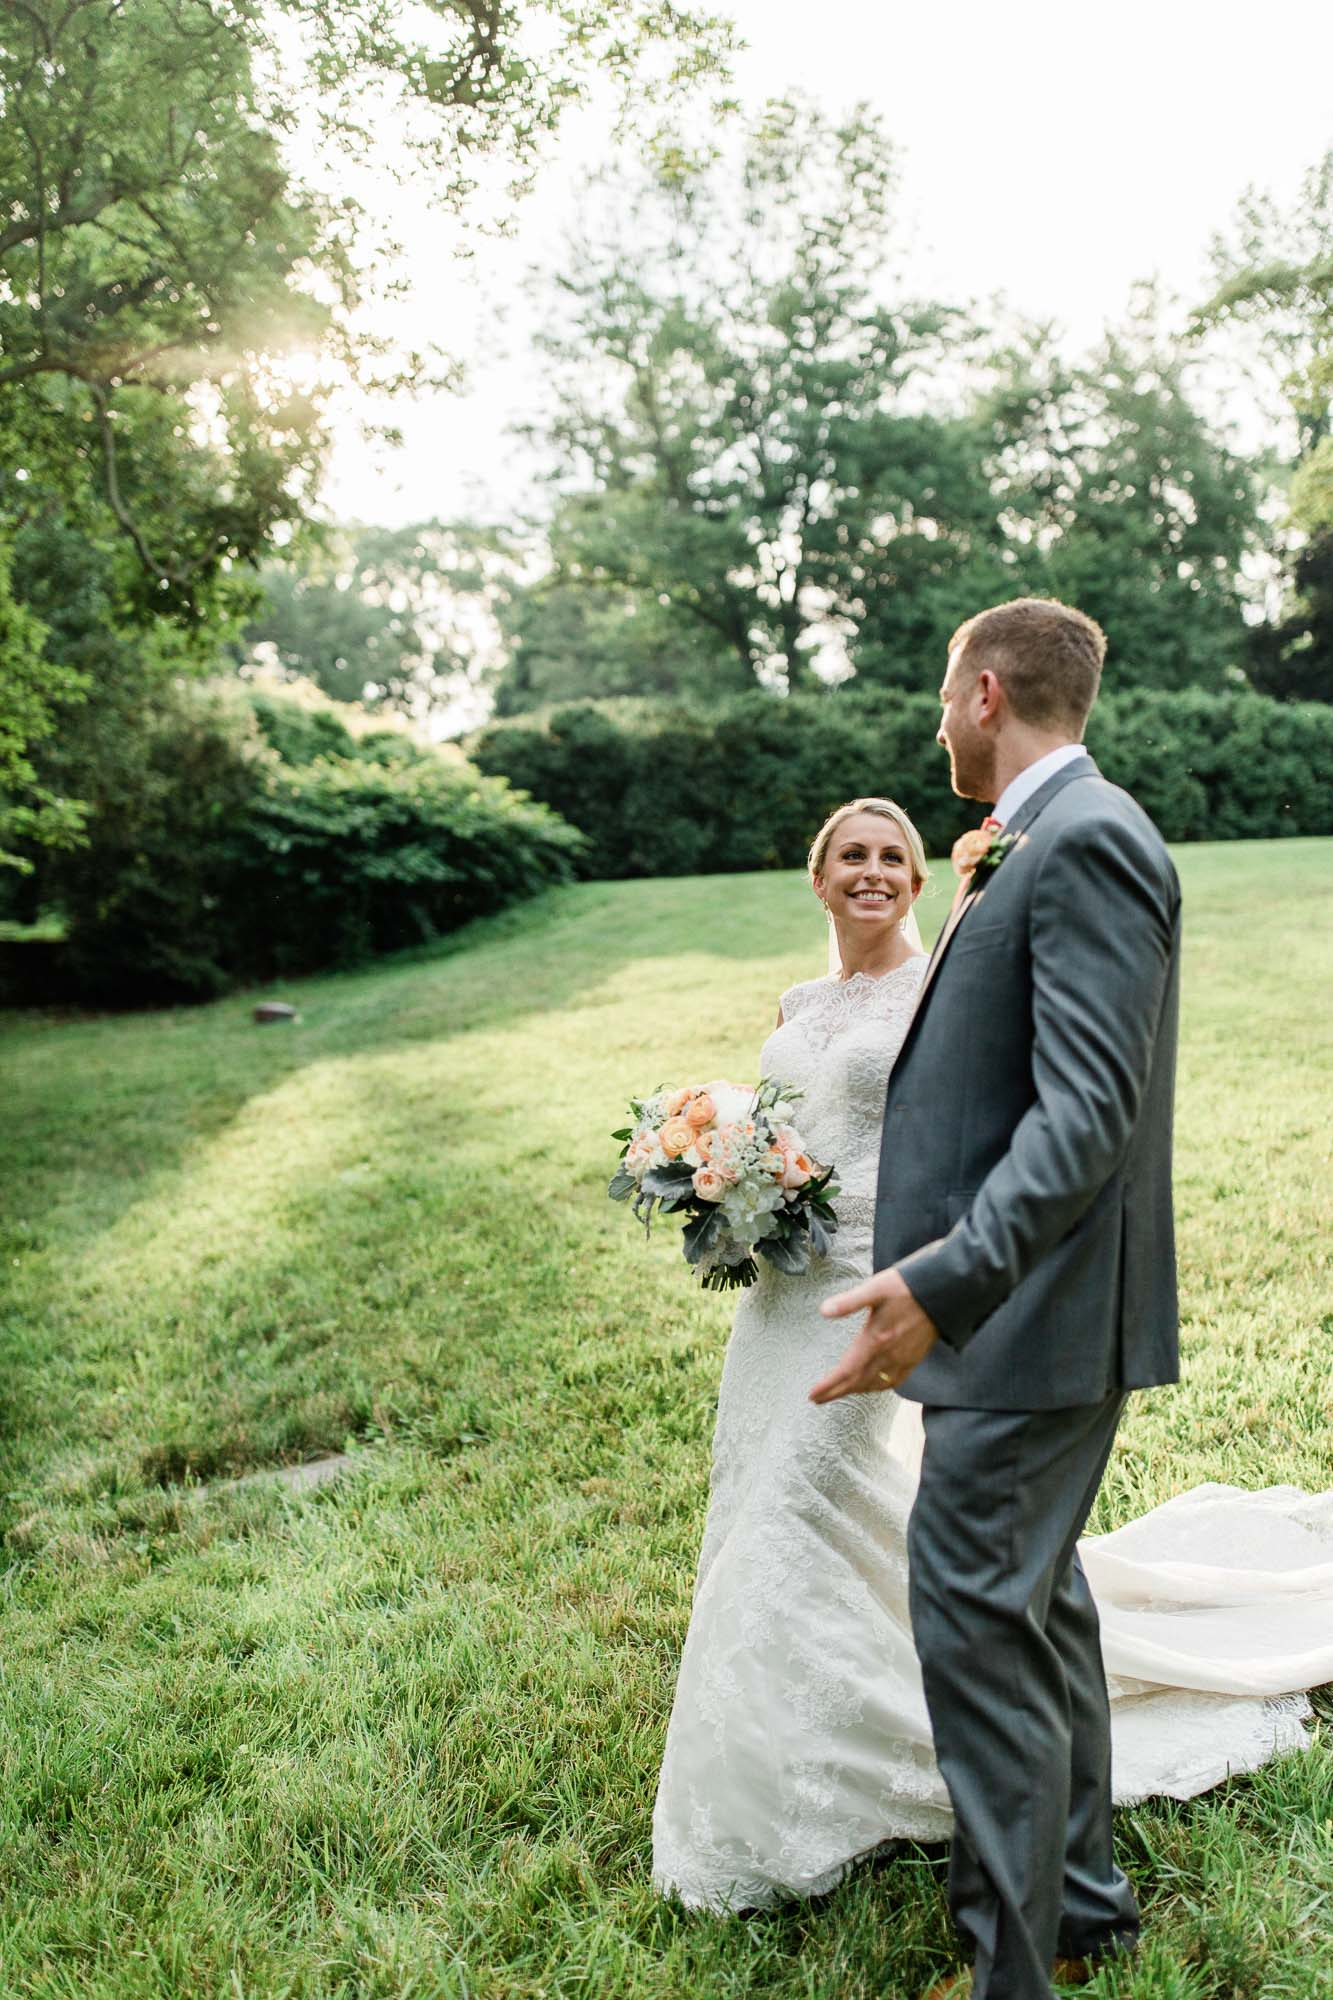 Allenberry-resort-historic-pennsylvania-wedding-10285.jpg